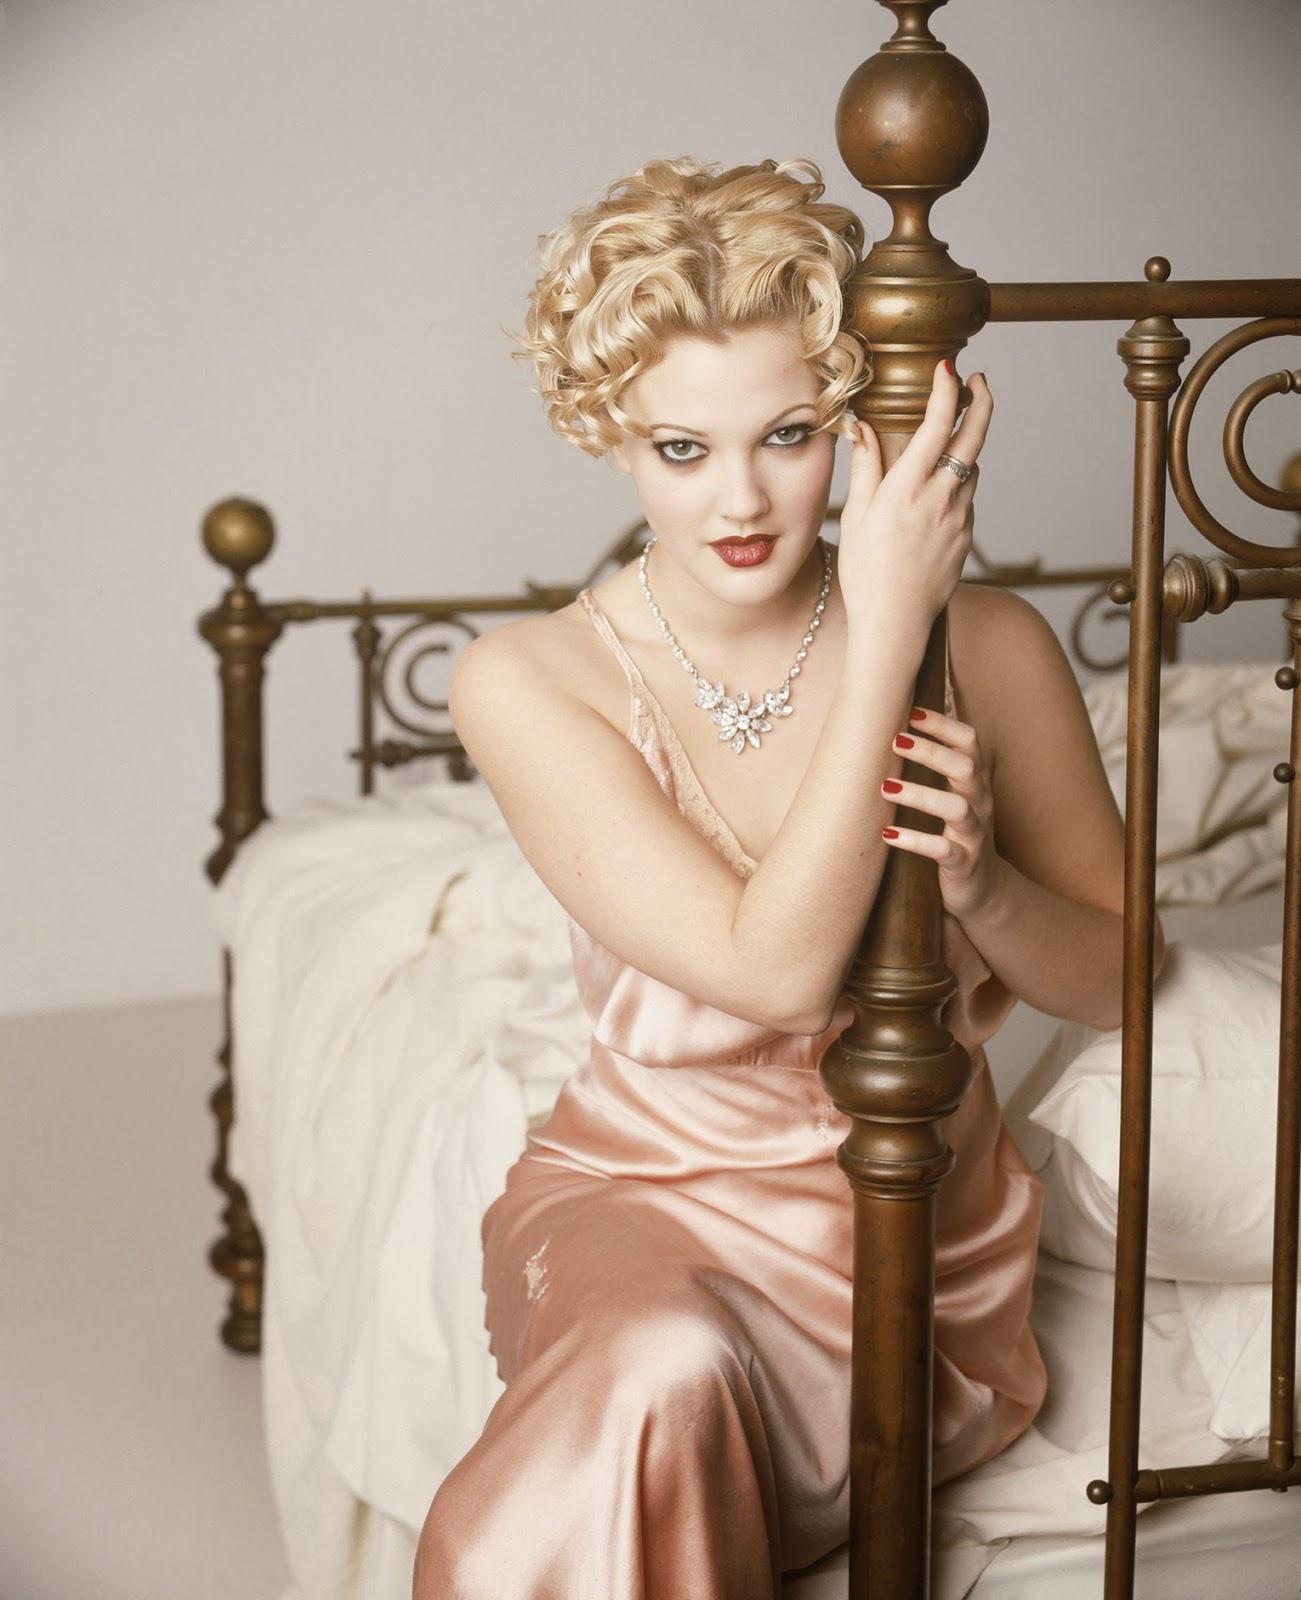 Britt robertson nude almost nude